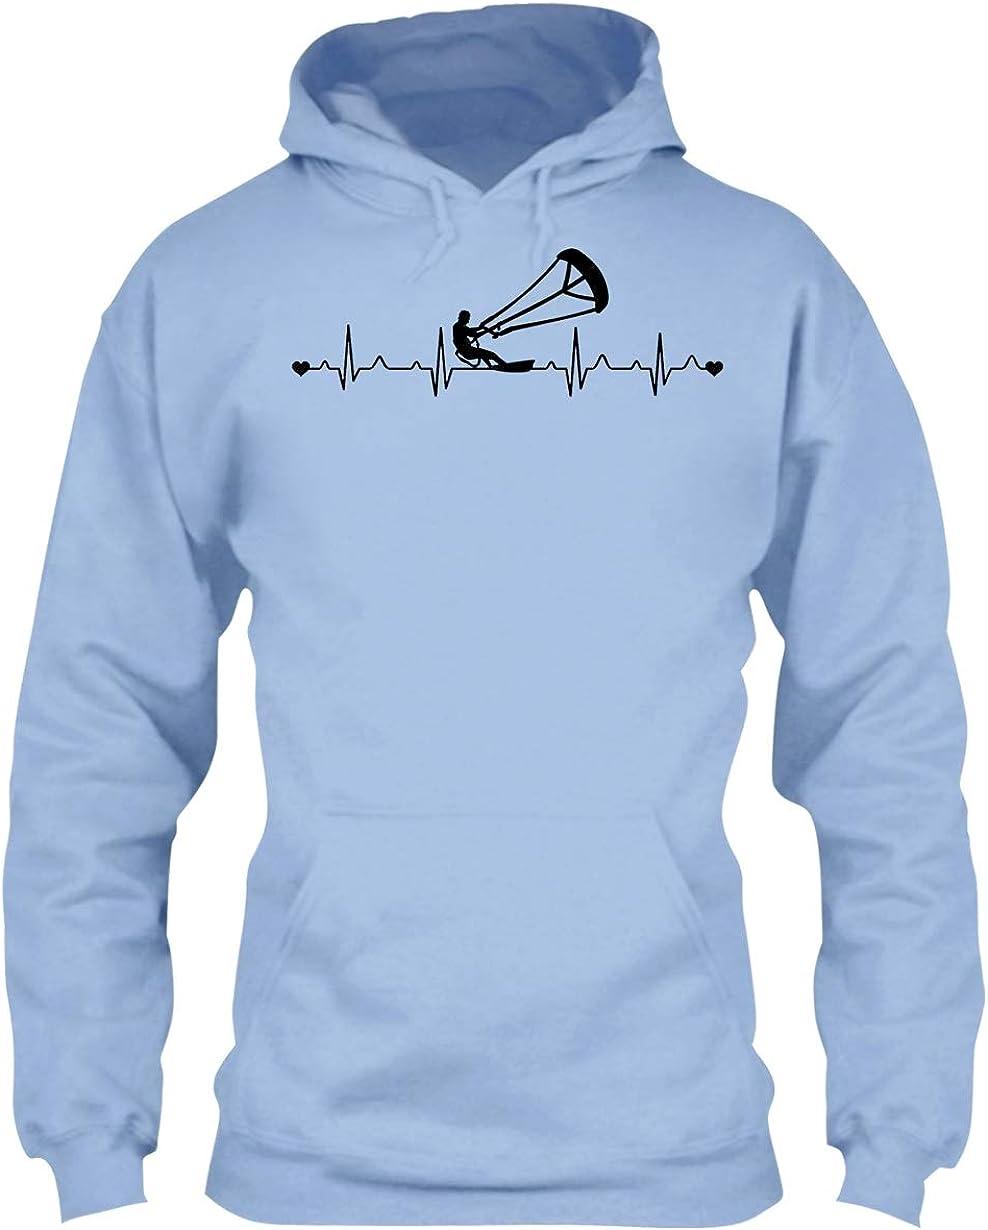 My Life is Kitesurfing T Shirt Seewhite Kitesurfing Tshirt Design